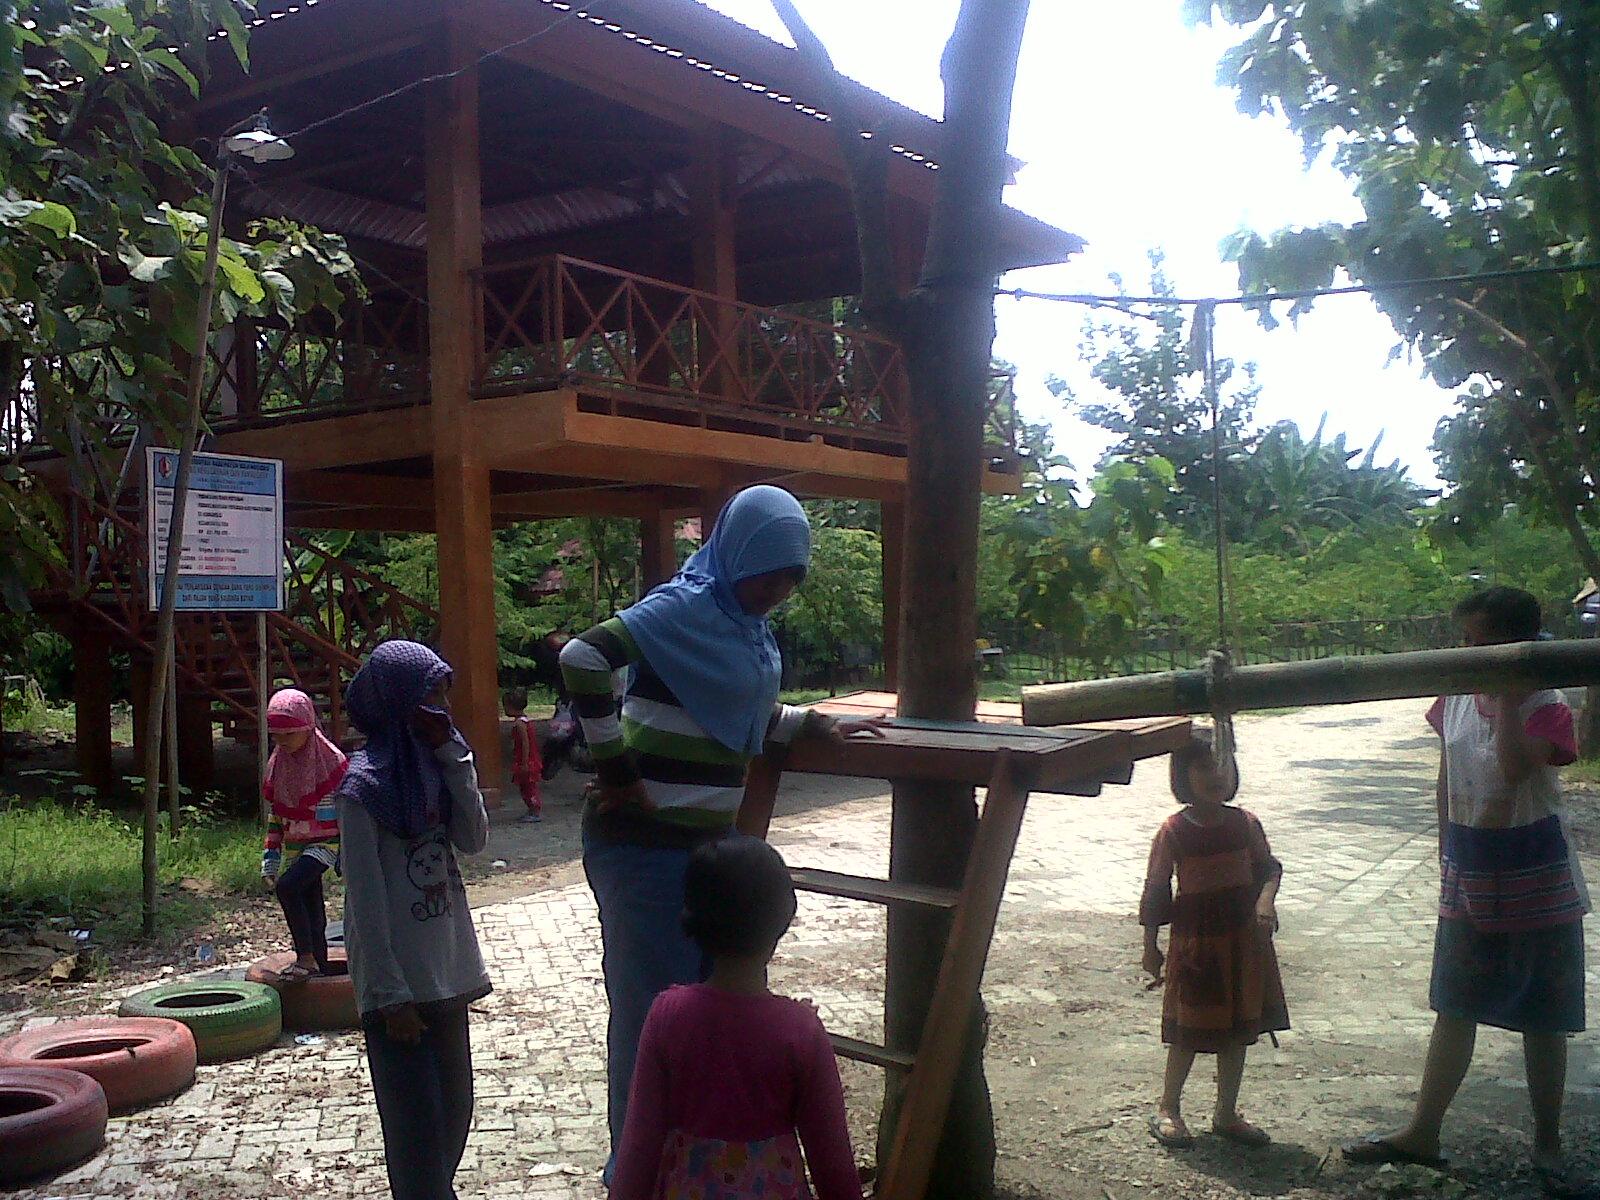 Pemerintah Kabupaten Bojonegoro Bojonegorokab Id Jumlah Pengunjung Agrowisata Kebun Belimbing